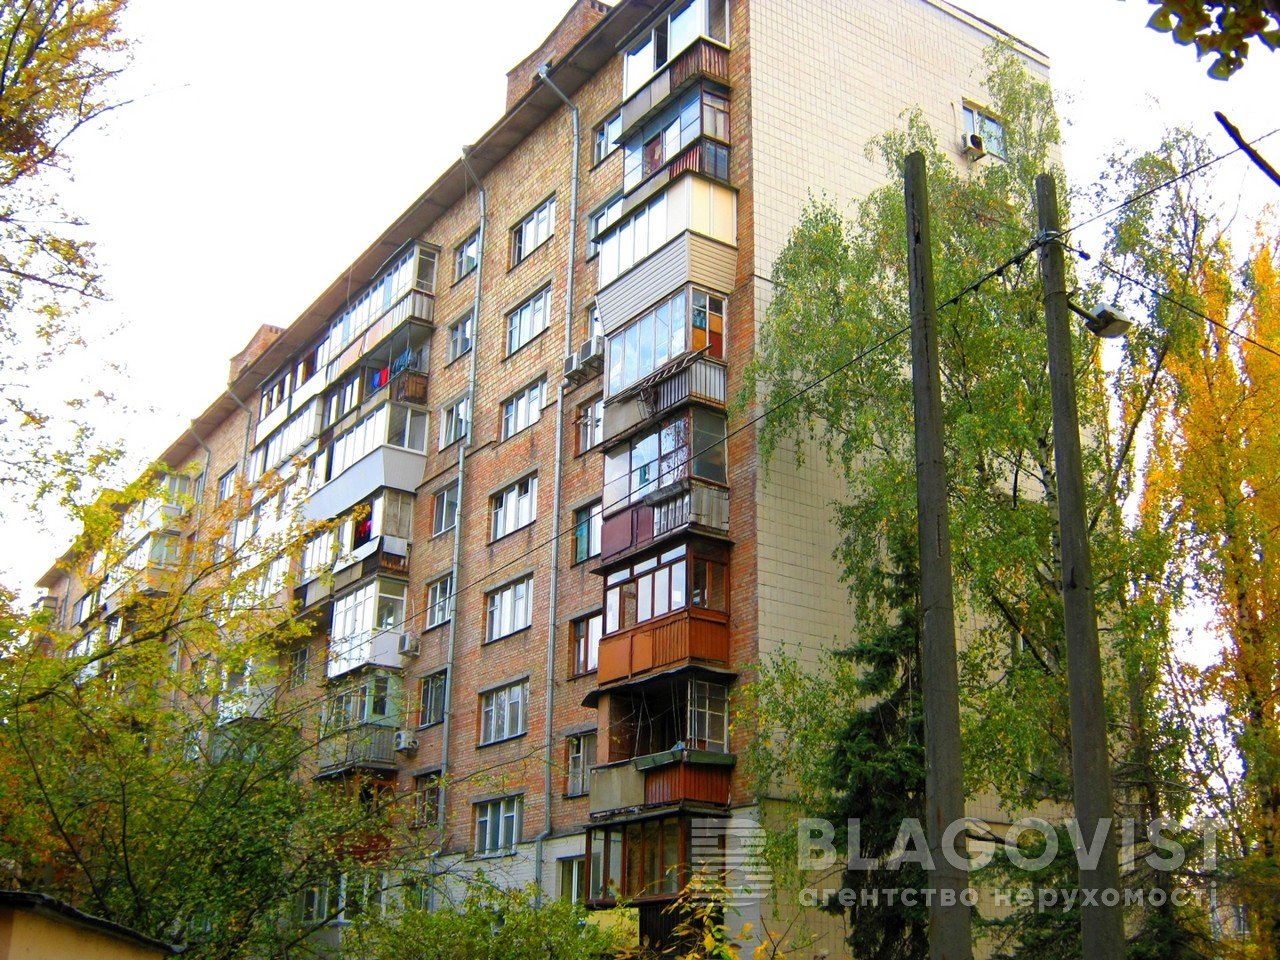 Квартира F-9454, Новогоспитальная (Щорса пер.), 5, Киев - Фото 4